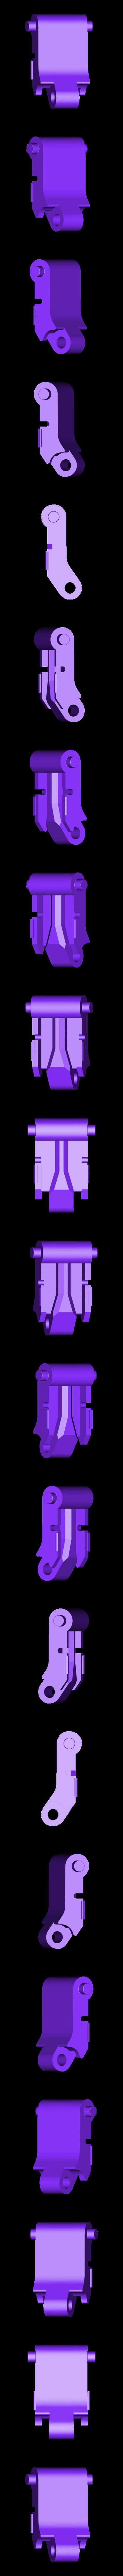 side Probe.stl Download STL file Humminbird 525 echo sounder • Template to 3D print, francknos